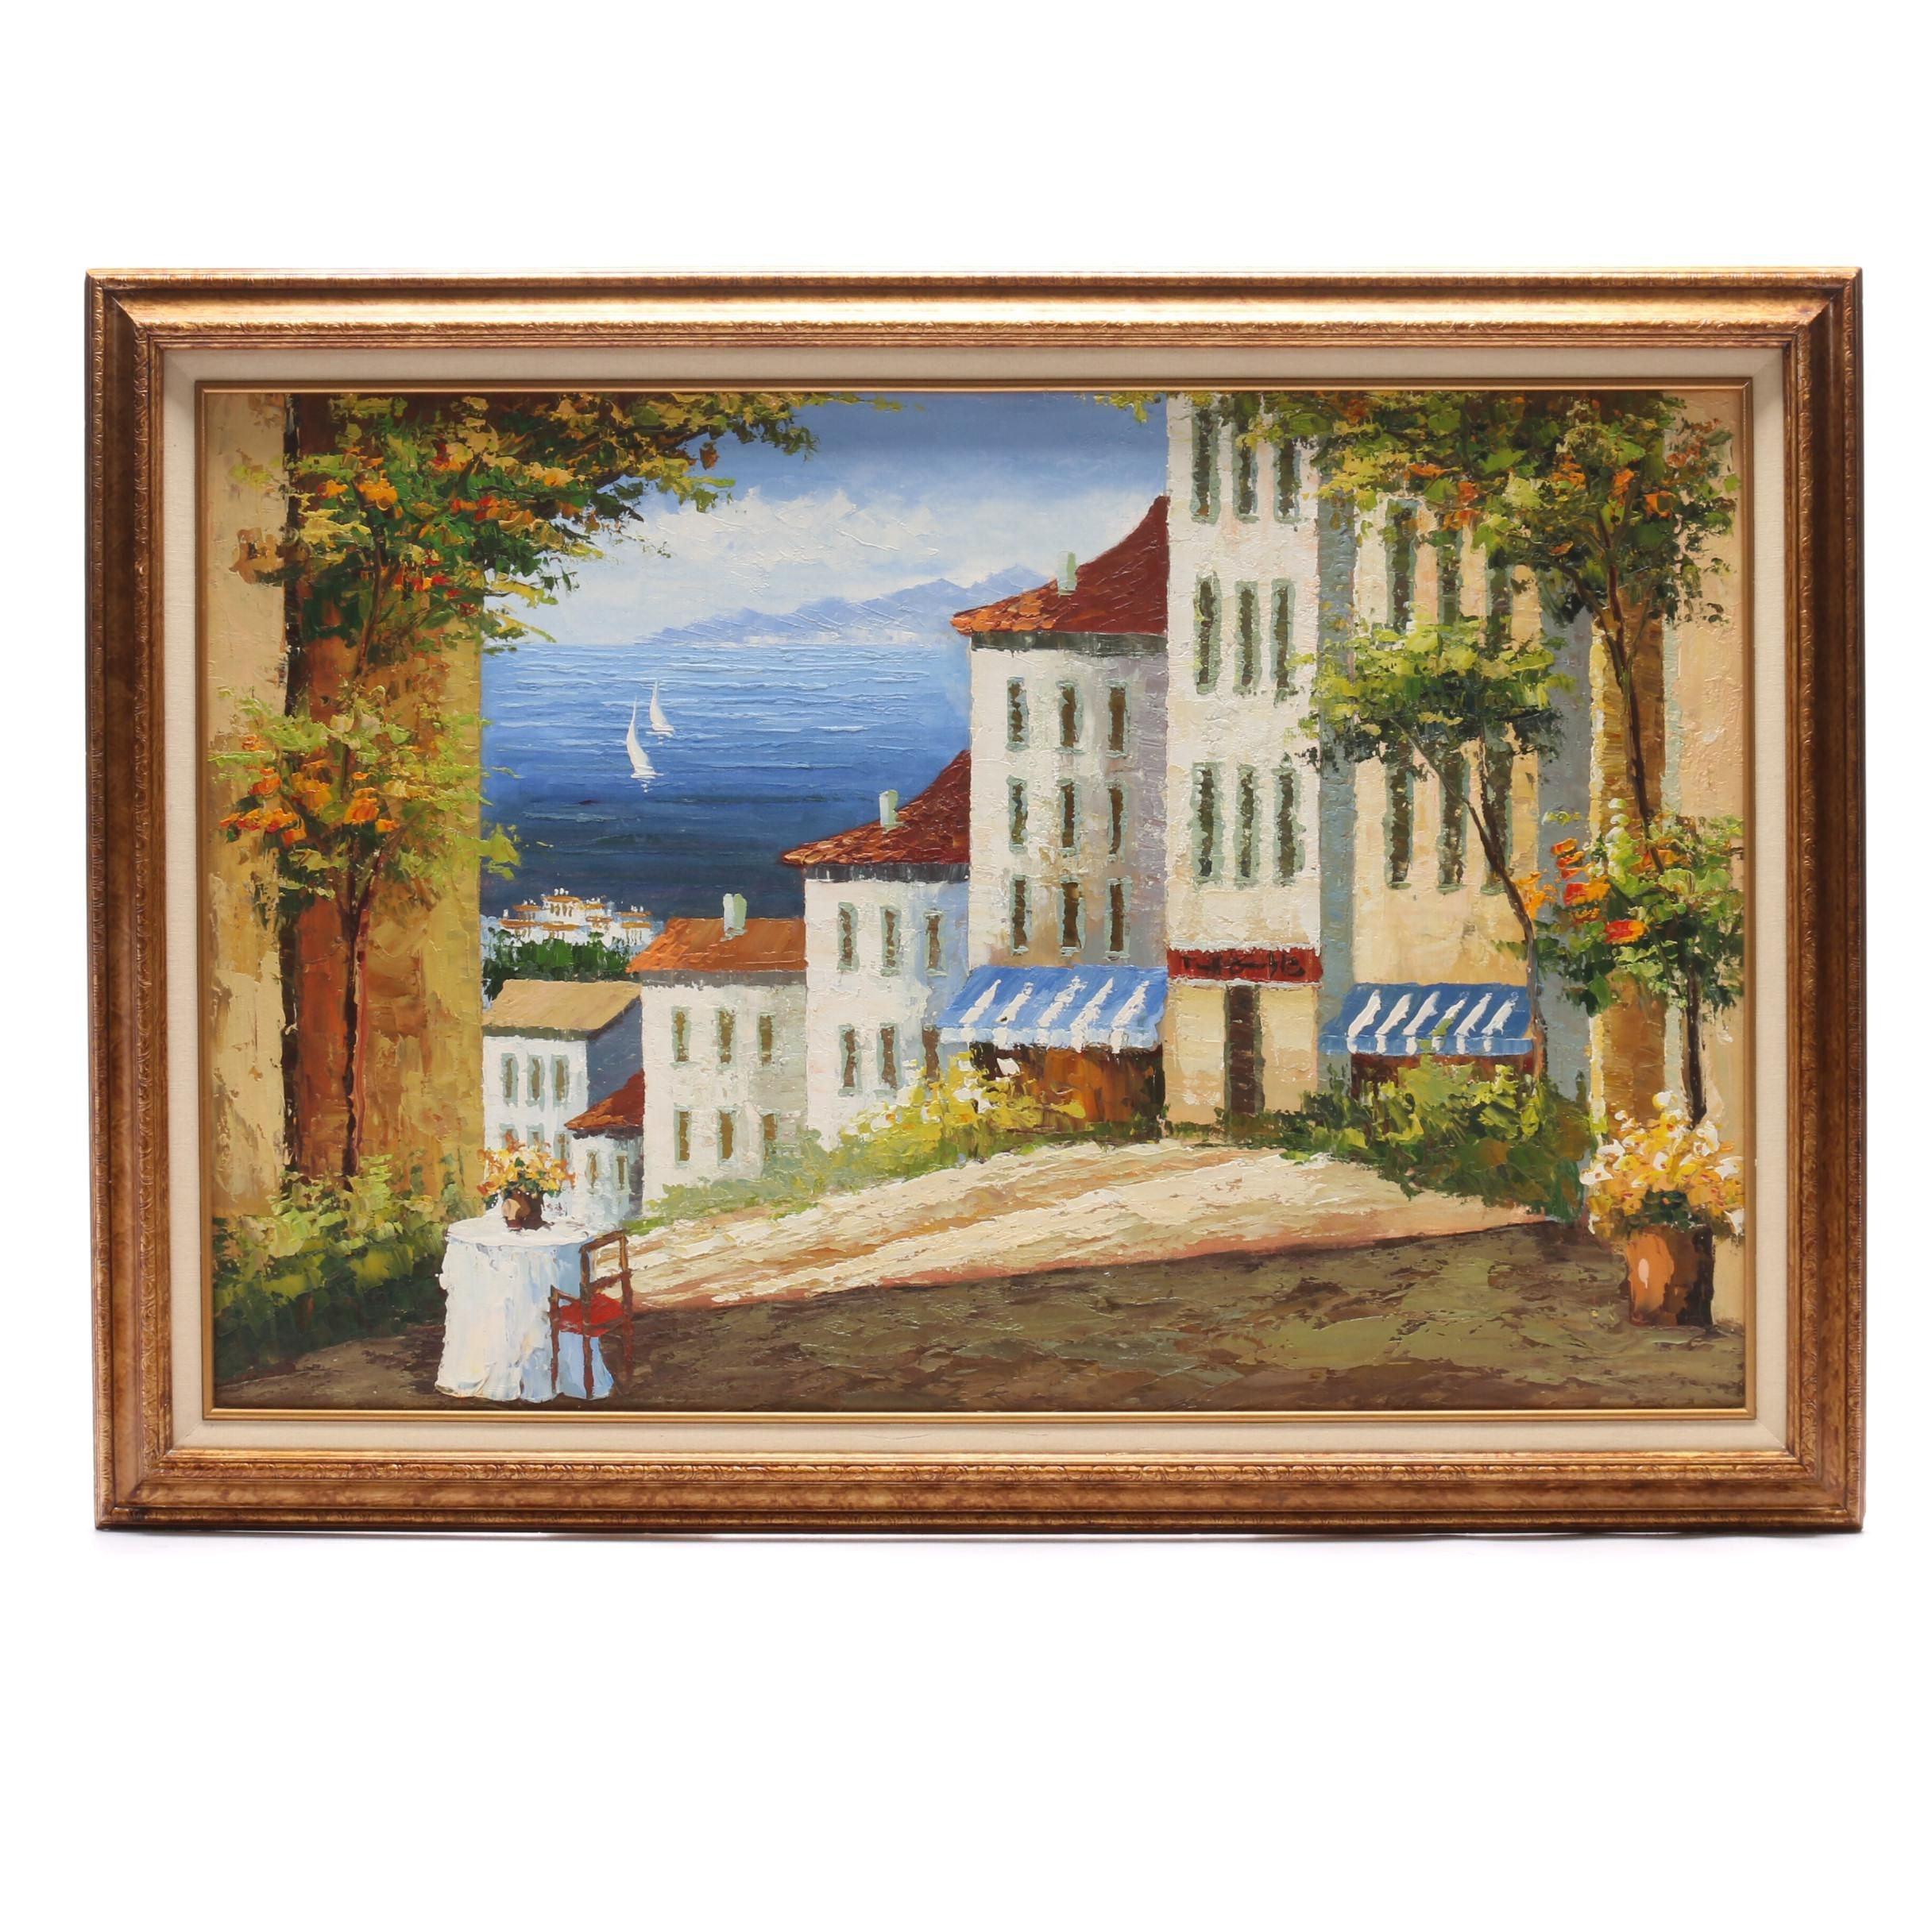 Acrylic Painting of Mediterranean Hillside Village